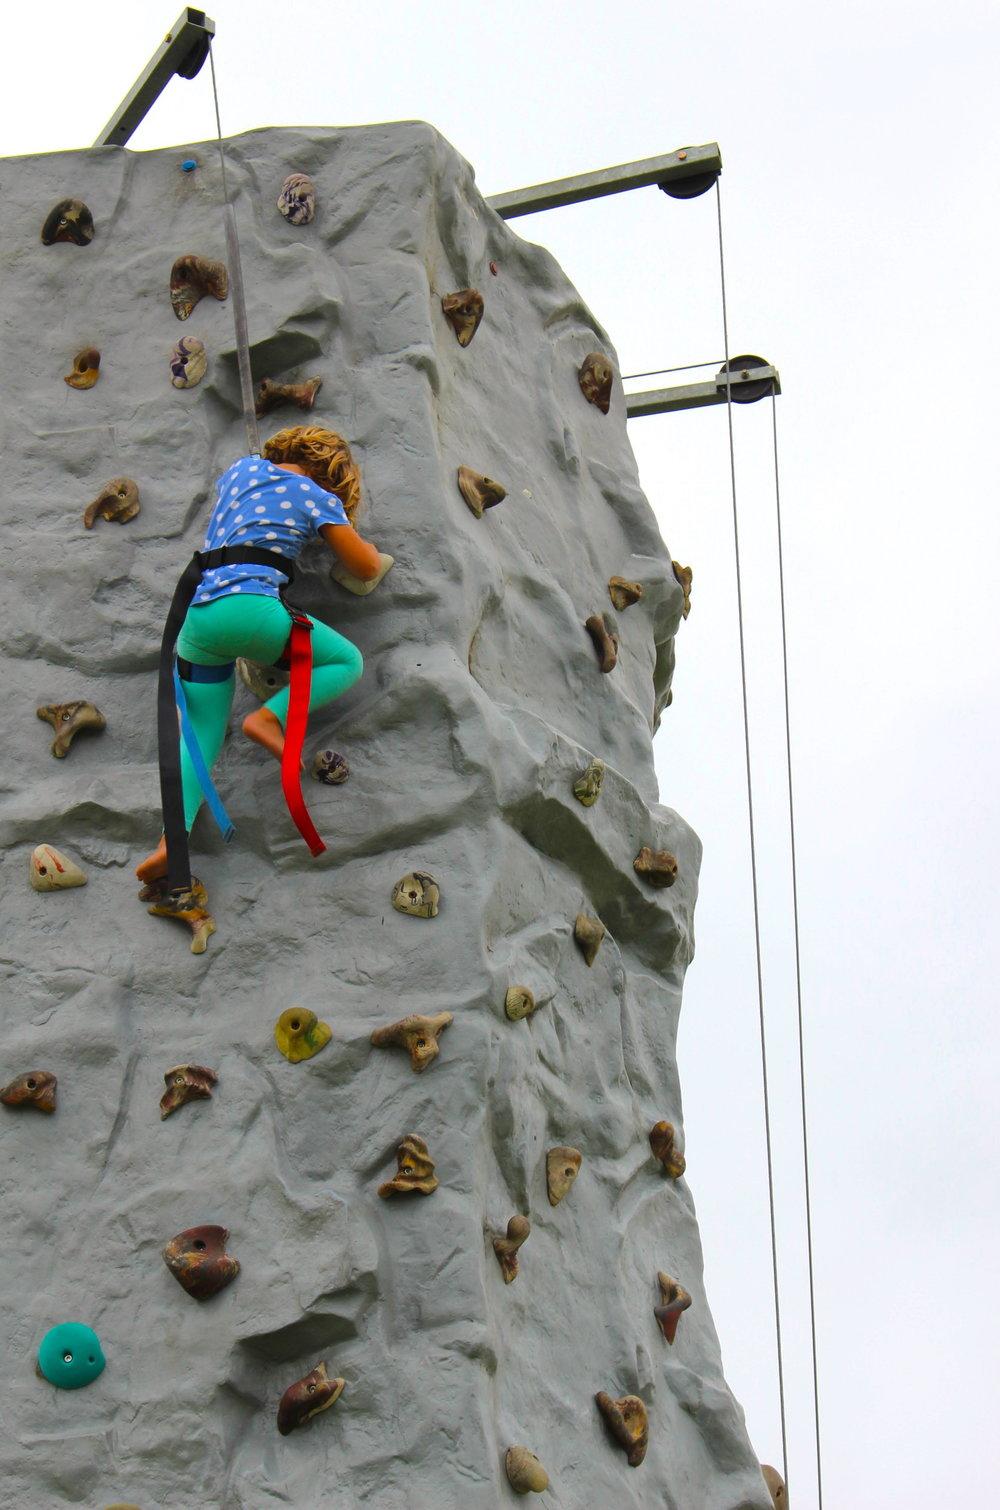 Child Rock Climber